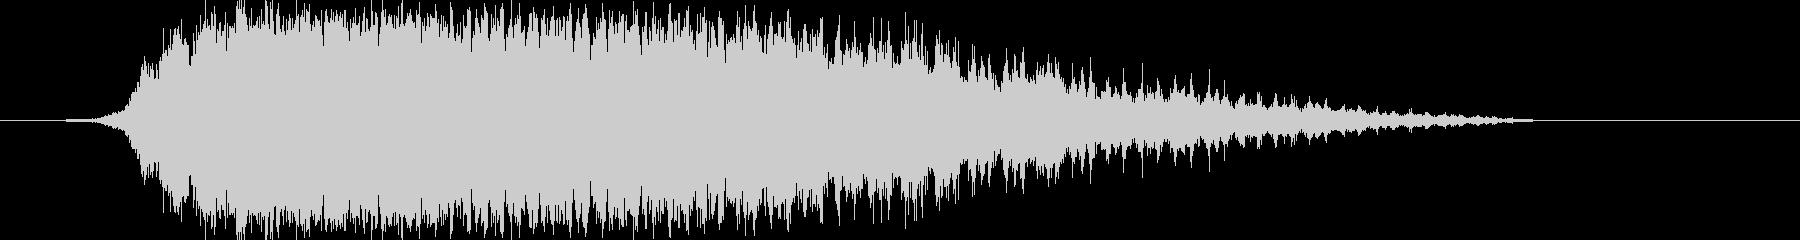 SHARPKNIFEバージョン4の未再生の波形